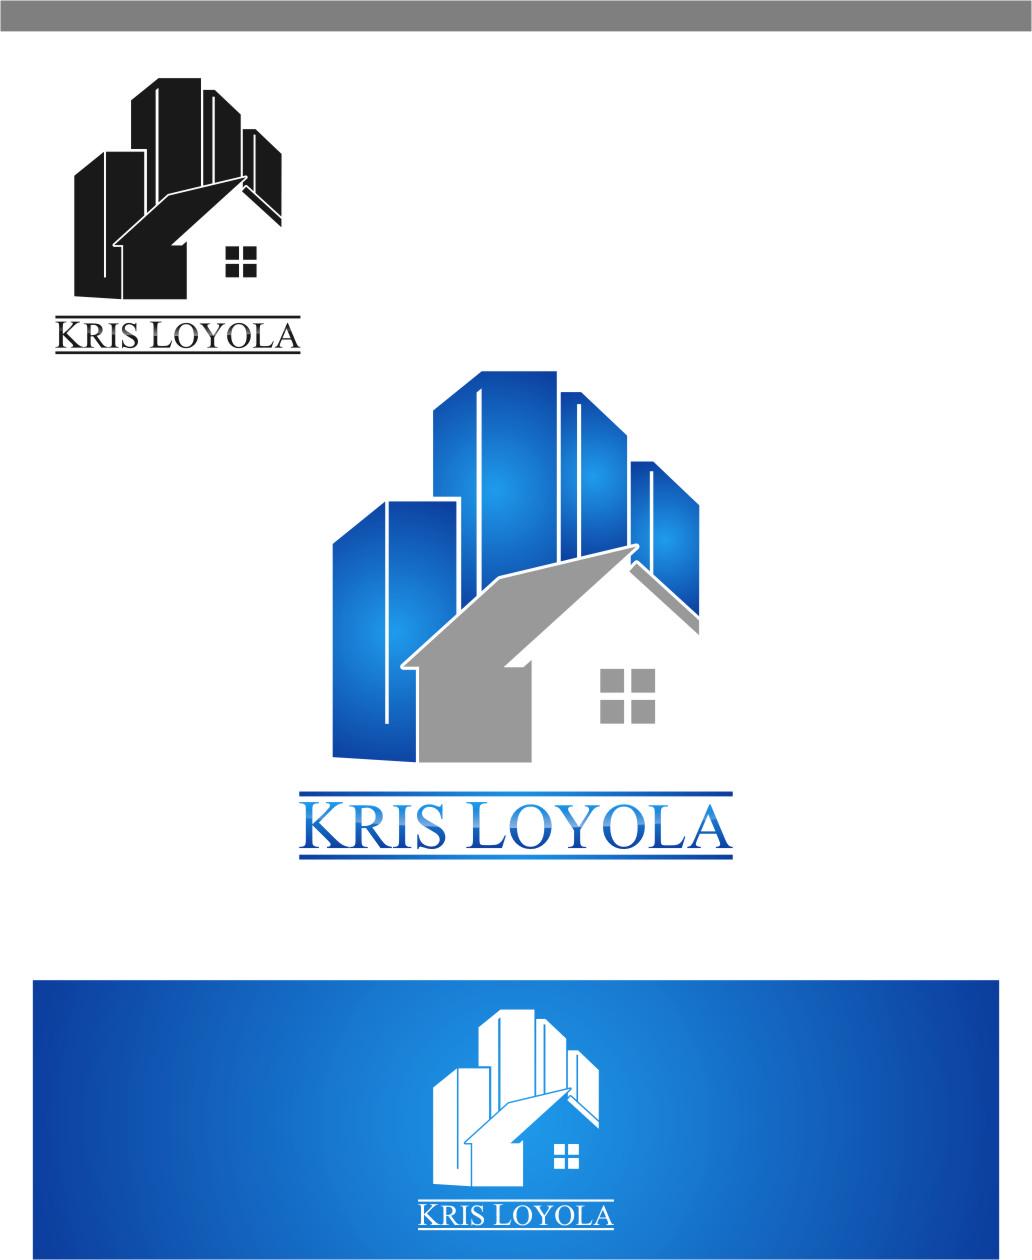 Logo Design by Ngepet_art - Entry No. 170 in the Logo Design Contest Kris Loyola Logo Design.